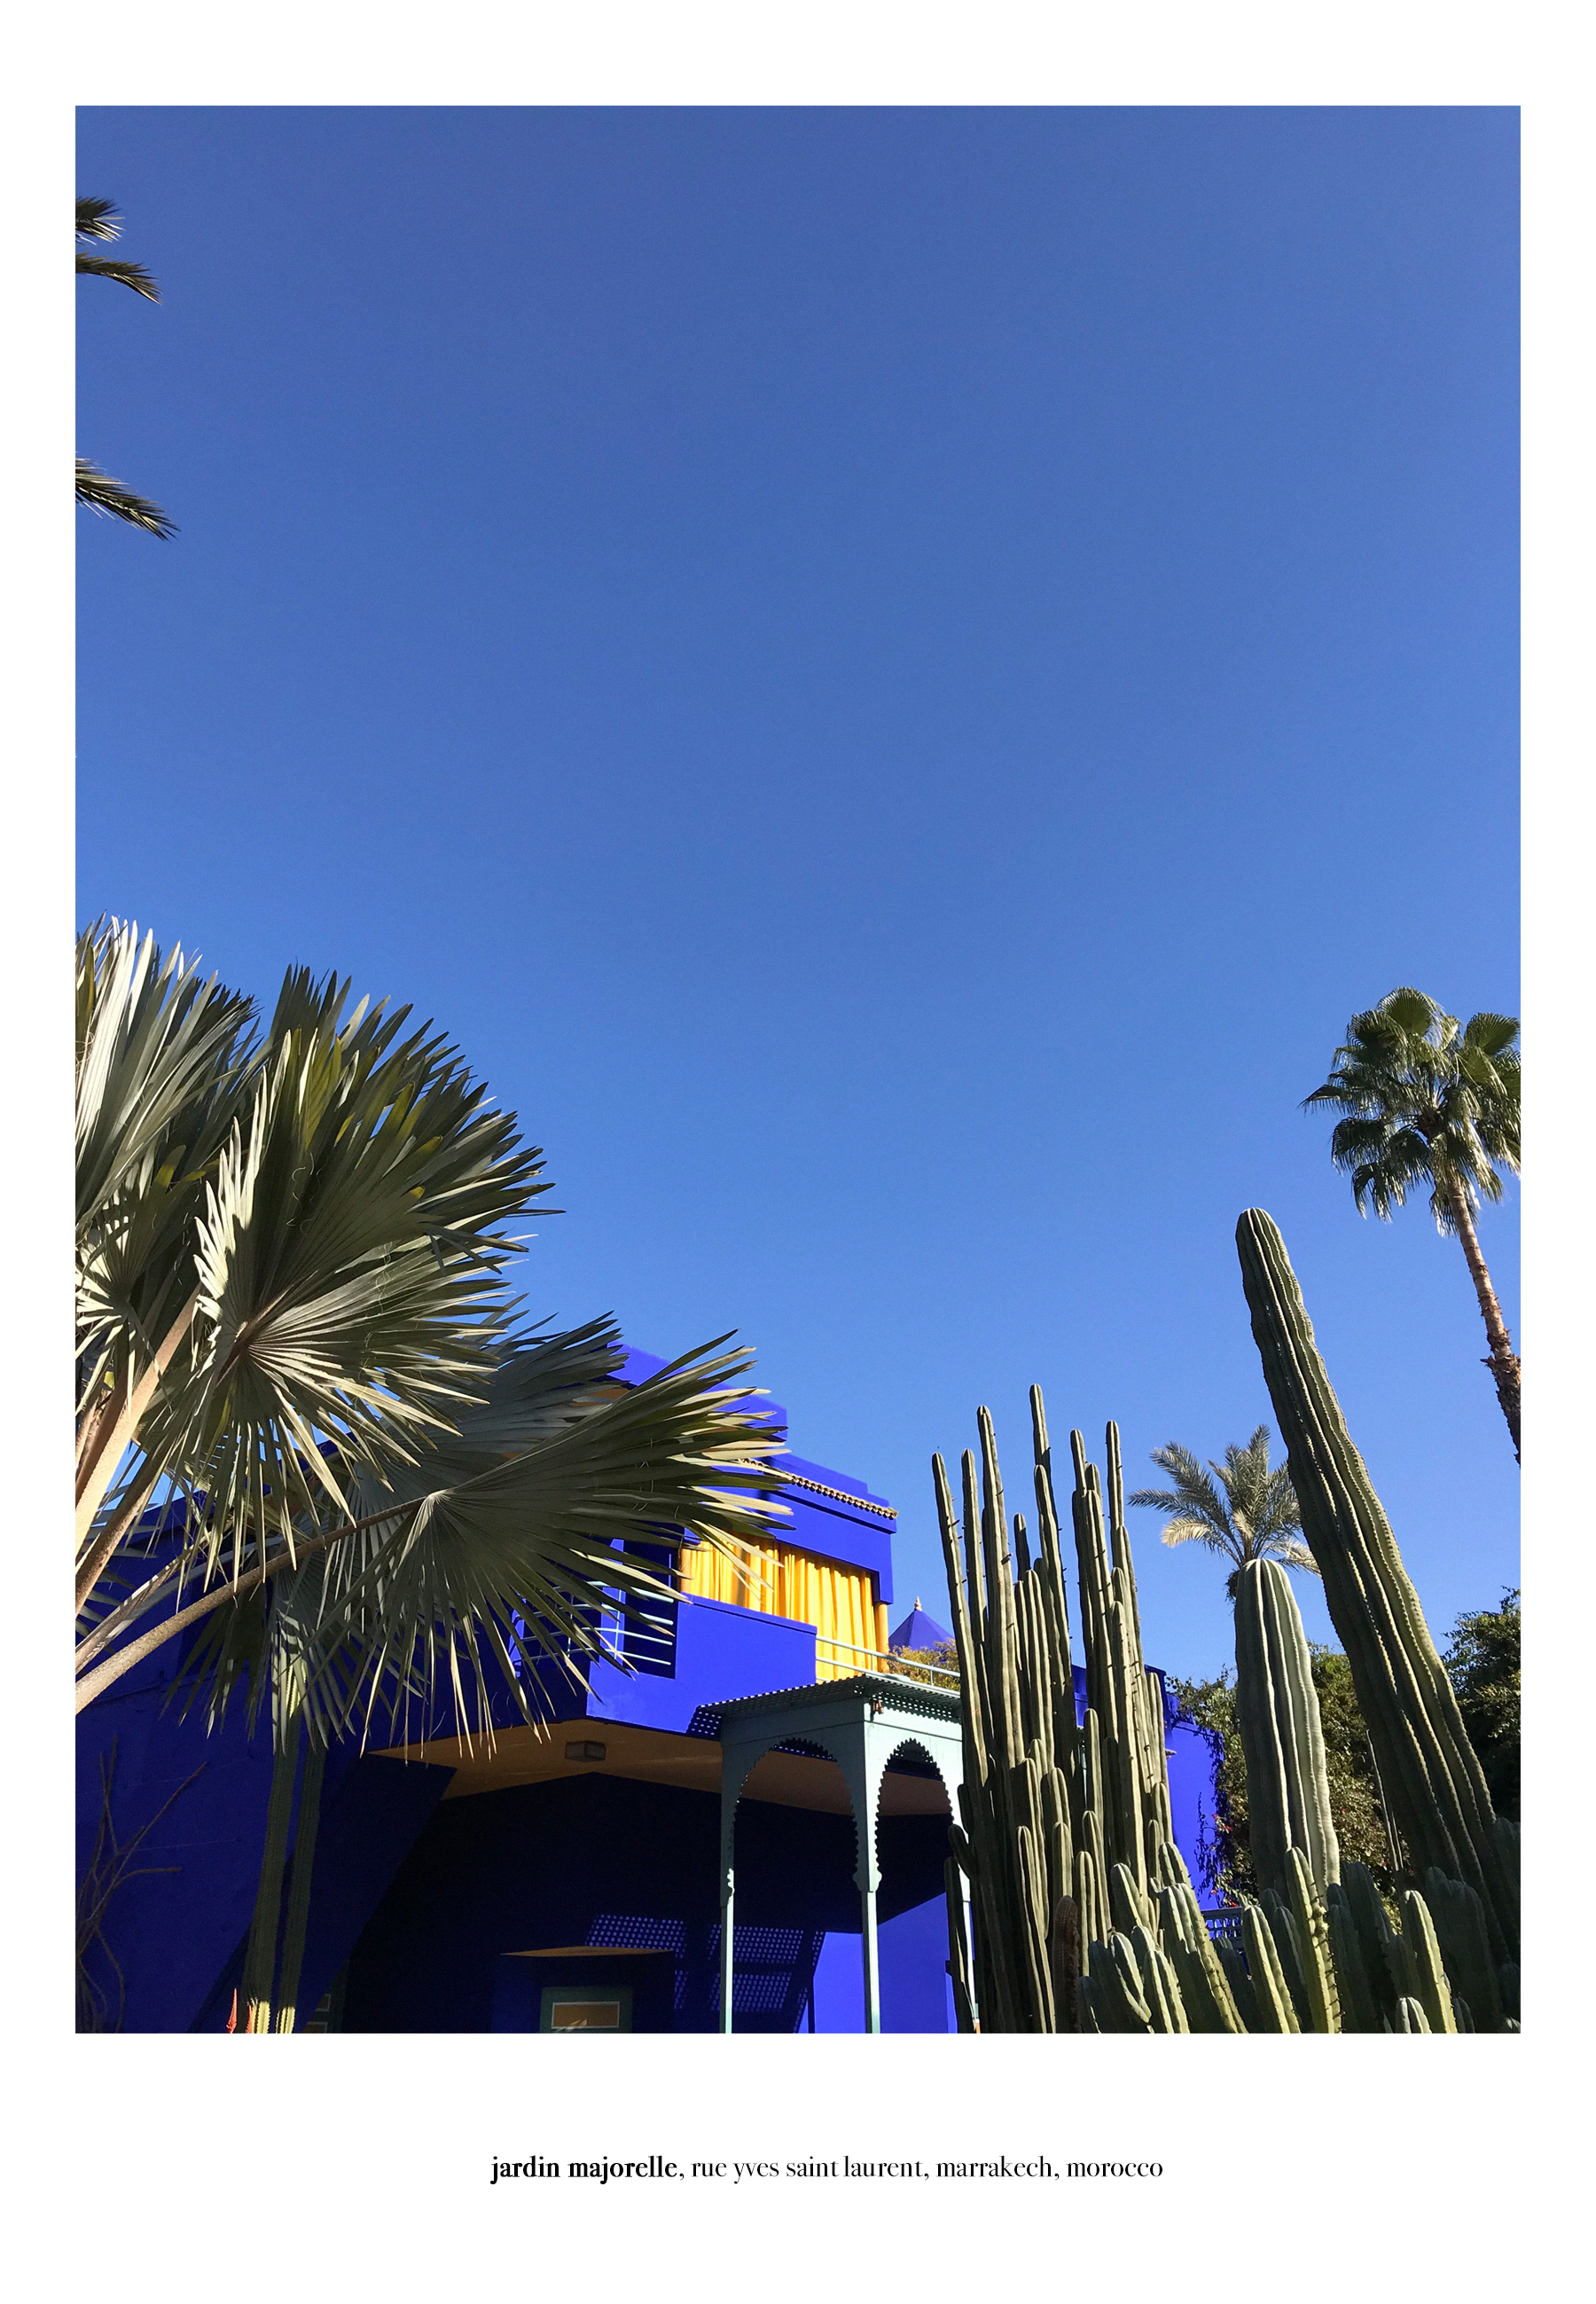 jardin majorelle yves saint laurent pierre bergé architecture musée museum morocco marrakech marrakesch travel travelblogger travelbloggers reiseblog reiseblogger reisebloggen inspiration blau bleu blue catsanddogsblog ricarda schernus max bechmann 7